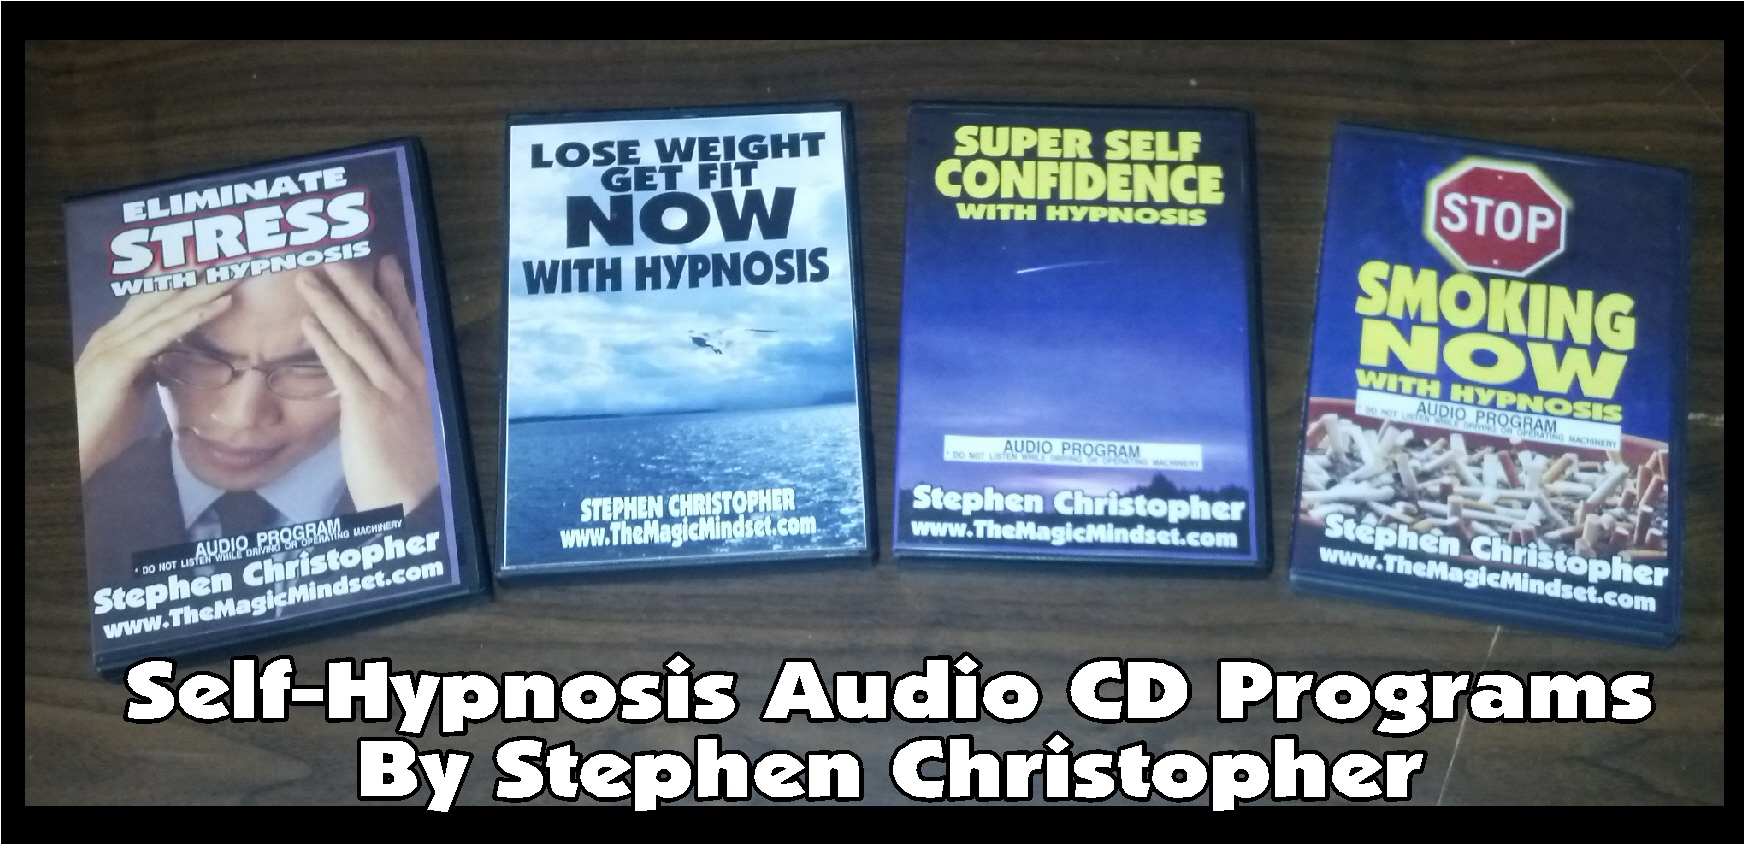 Audio Adventures - Nimja Hypnosis